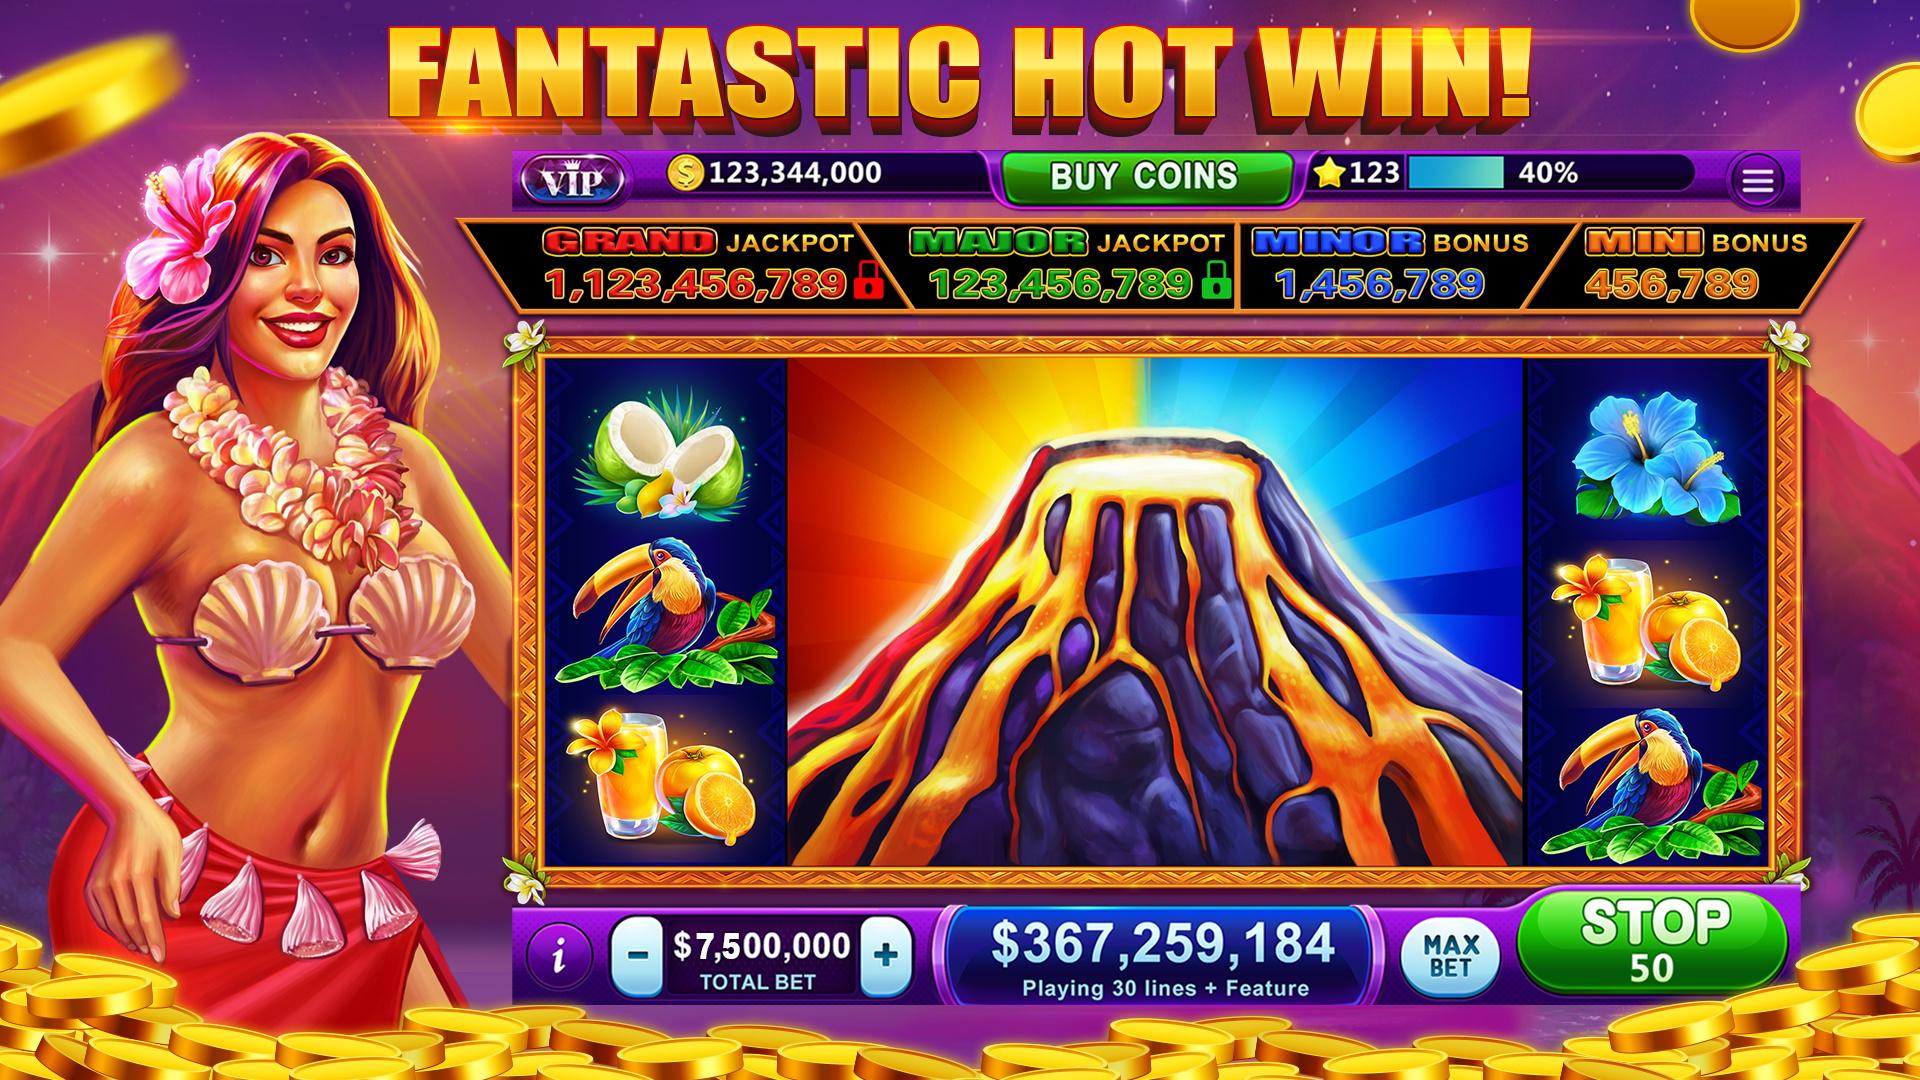 Casino online dinero real sin deposito argentina